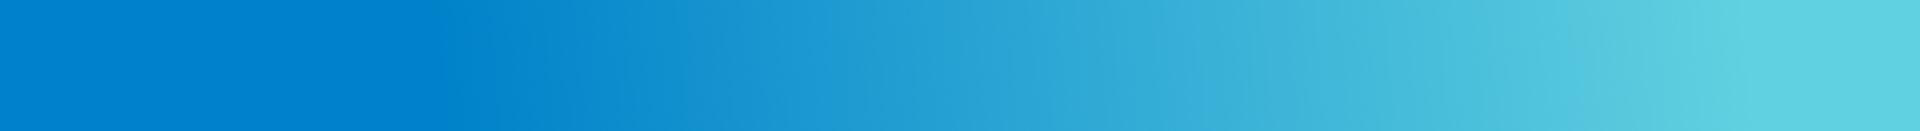 Aqua gradient